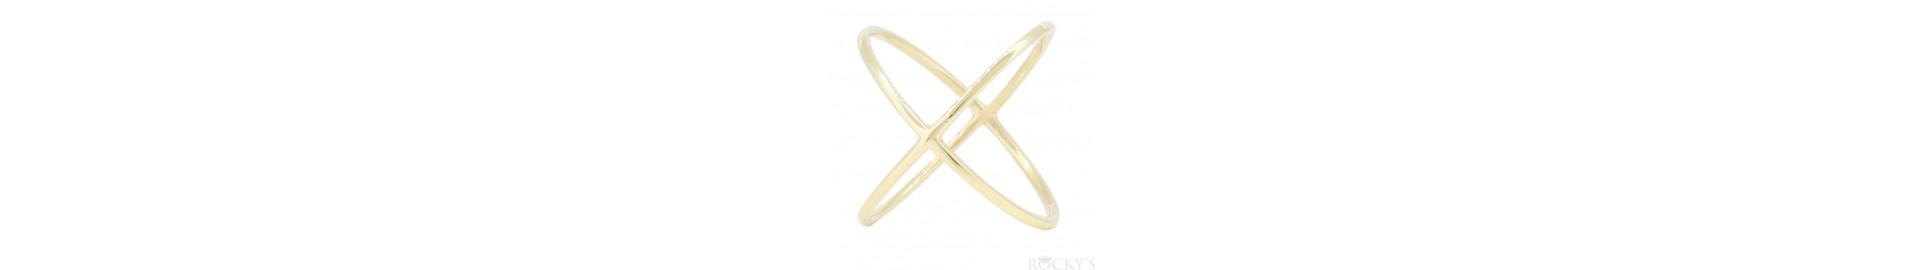 Ladies Gold Ring's